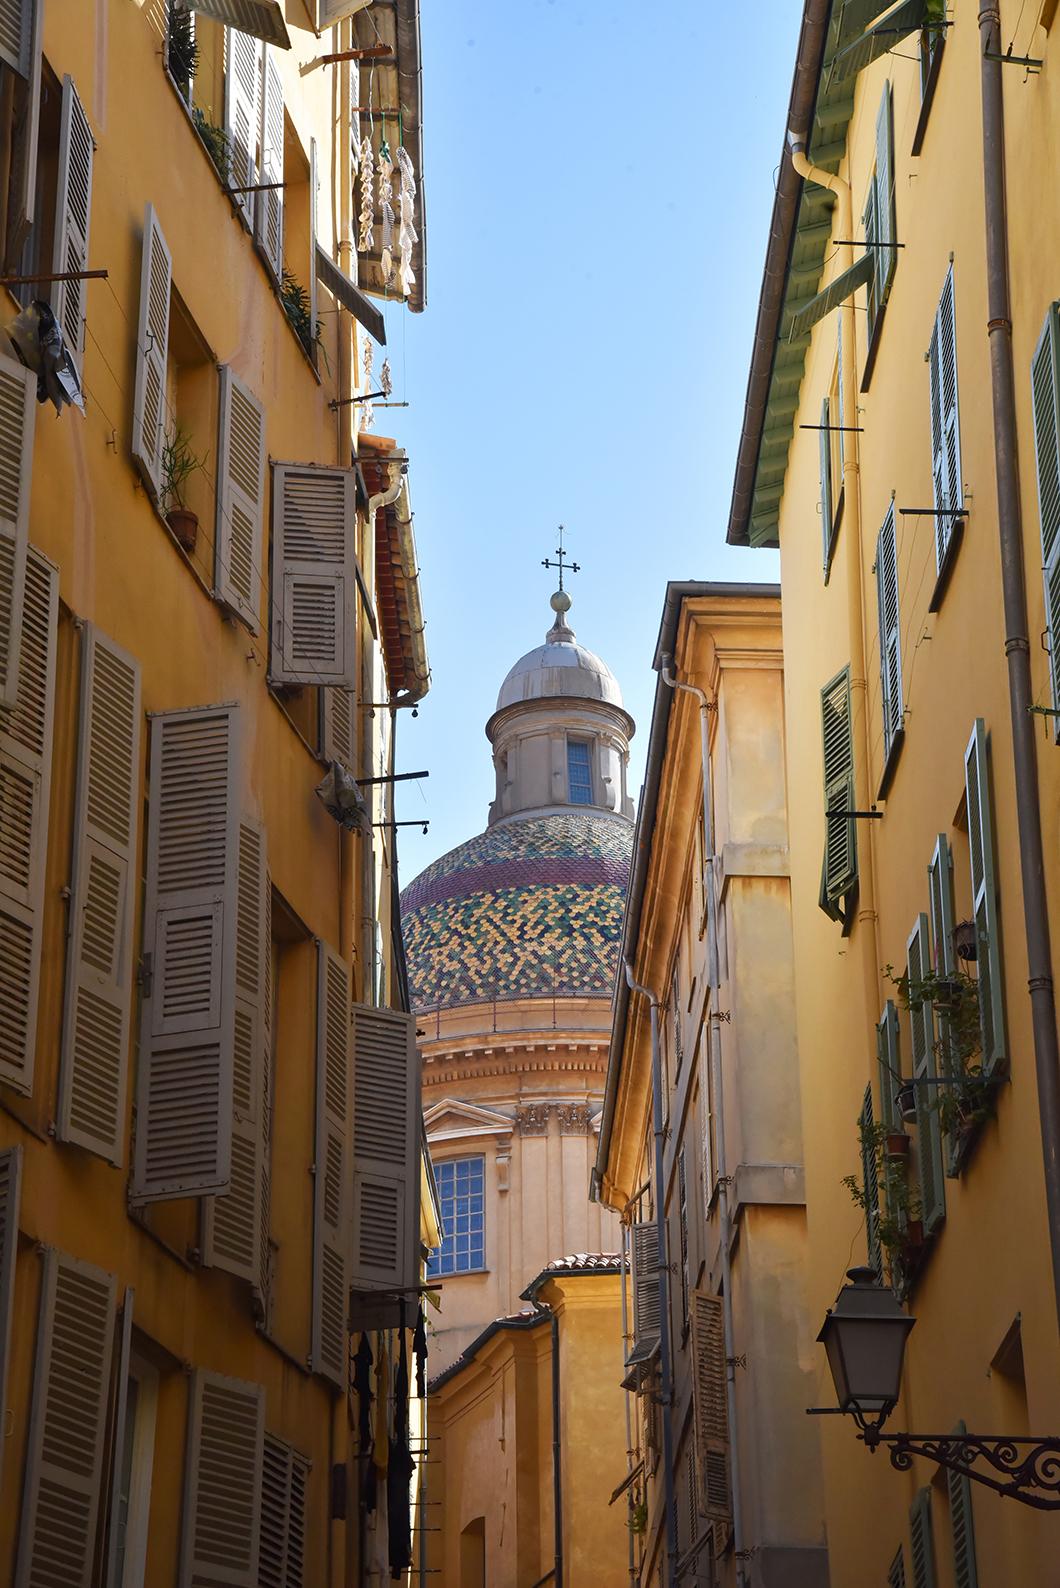 Un week end à Nice - Vieux Nice